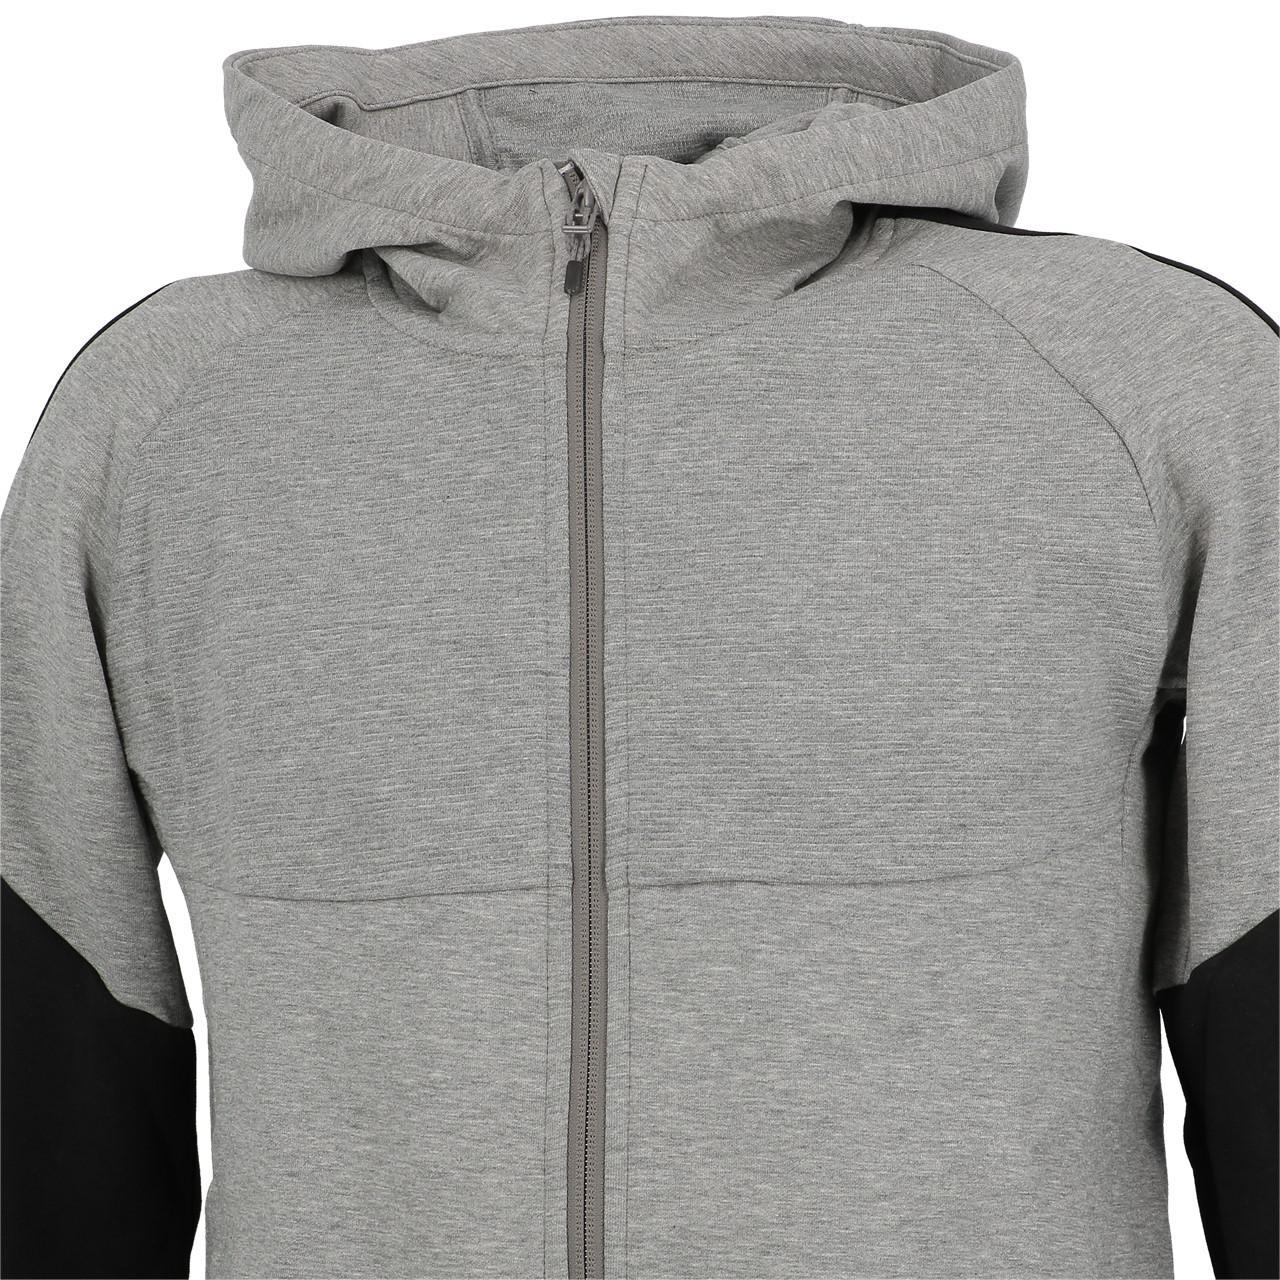 Jacken-Sweatshirts-Zipped-Kapuze-Puma-Evostripe-Anc-Fzcap-Sw-Jr-Grau-25708-Neu Indexbild 2